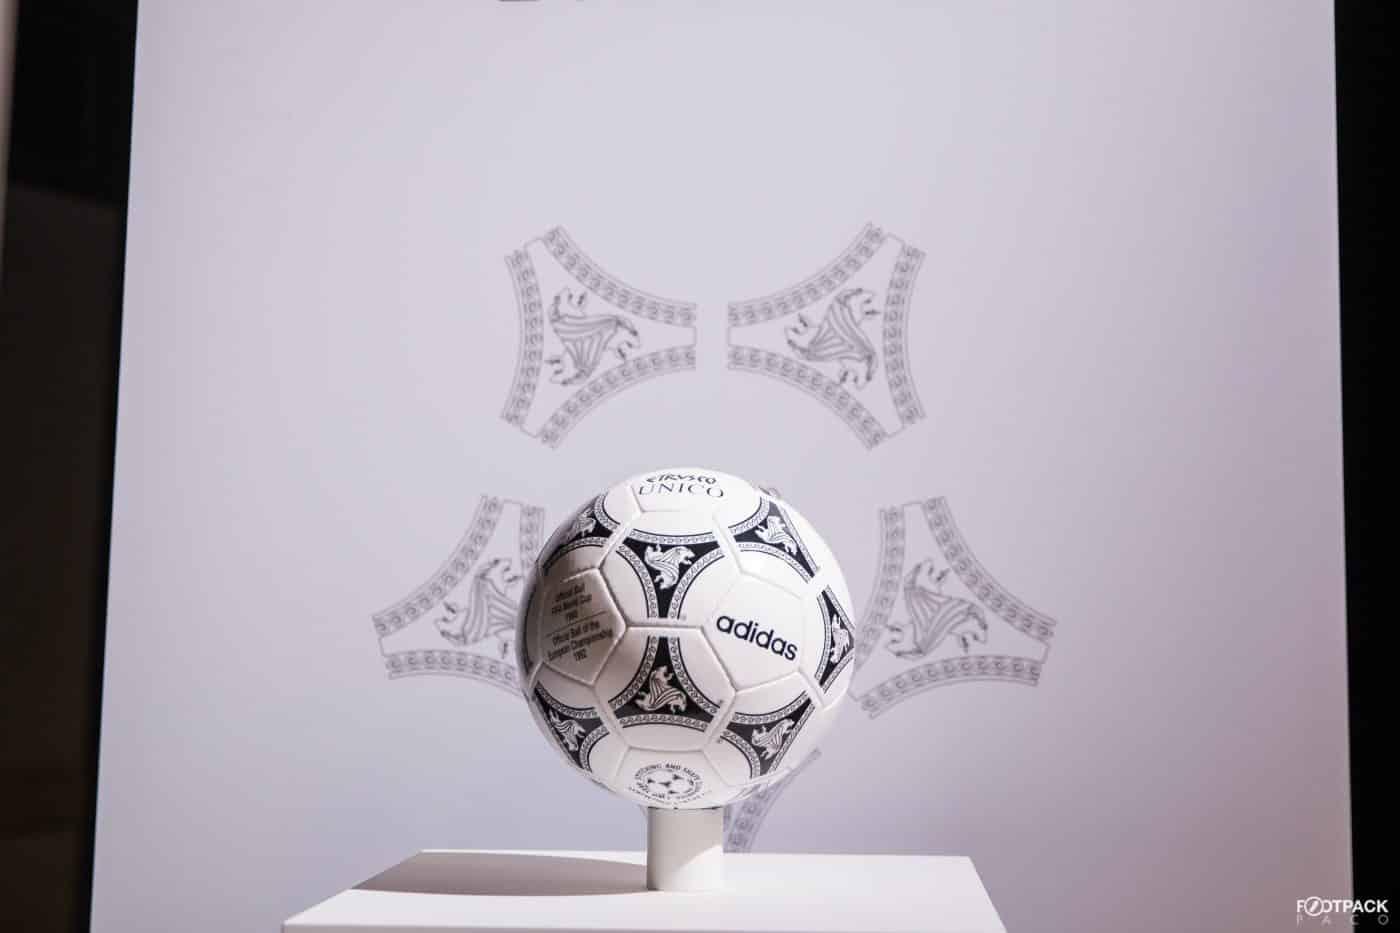 ballon-football-adidas-euro-1992-footpack-2019-2